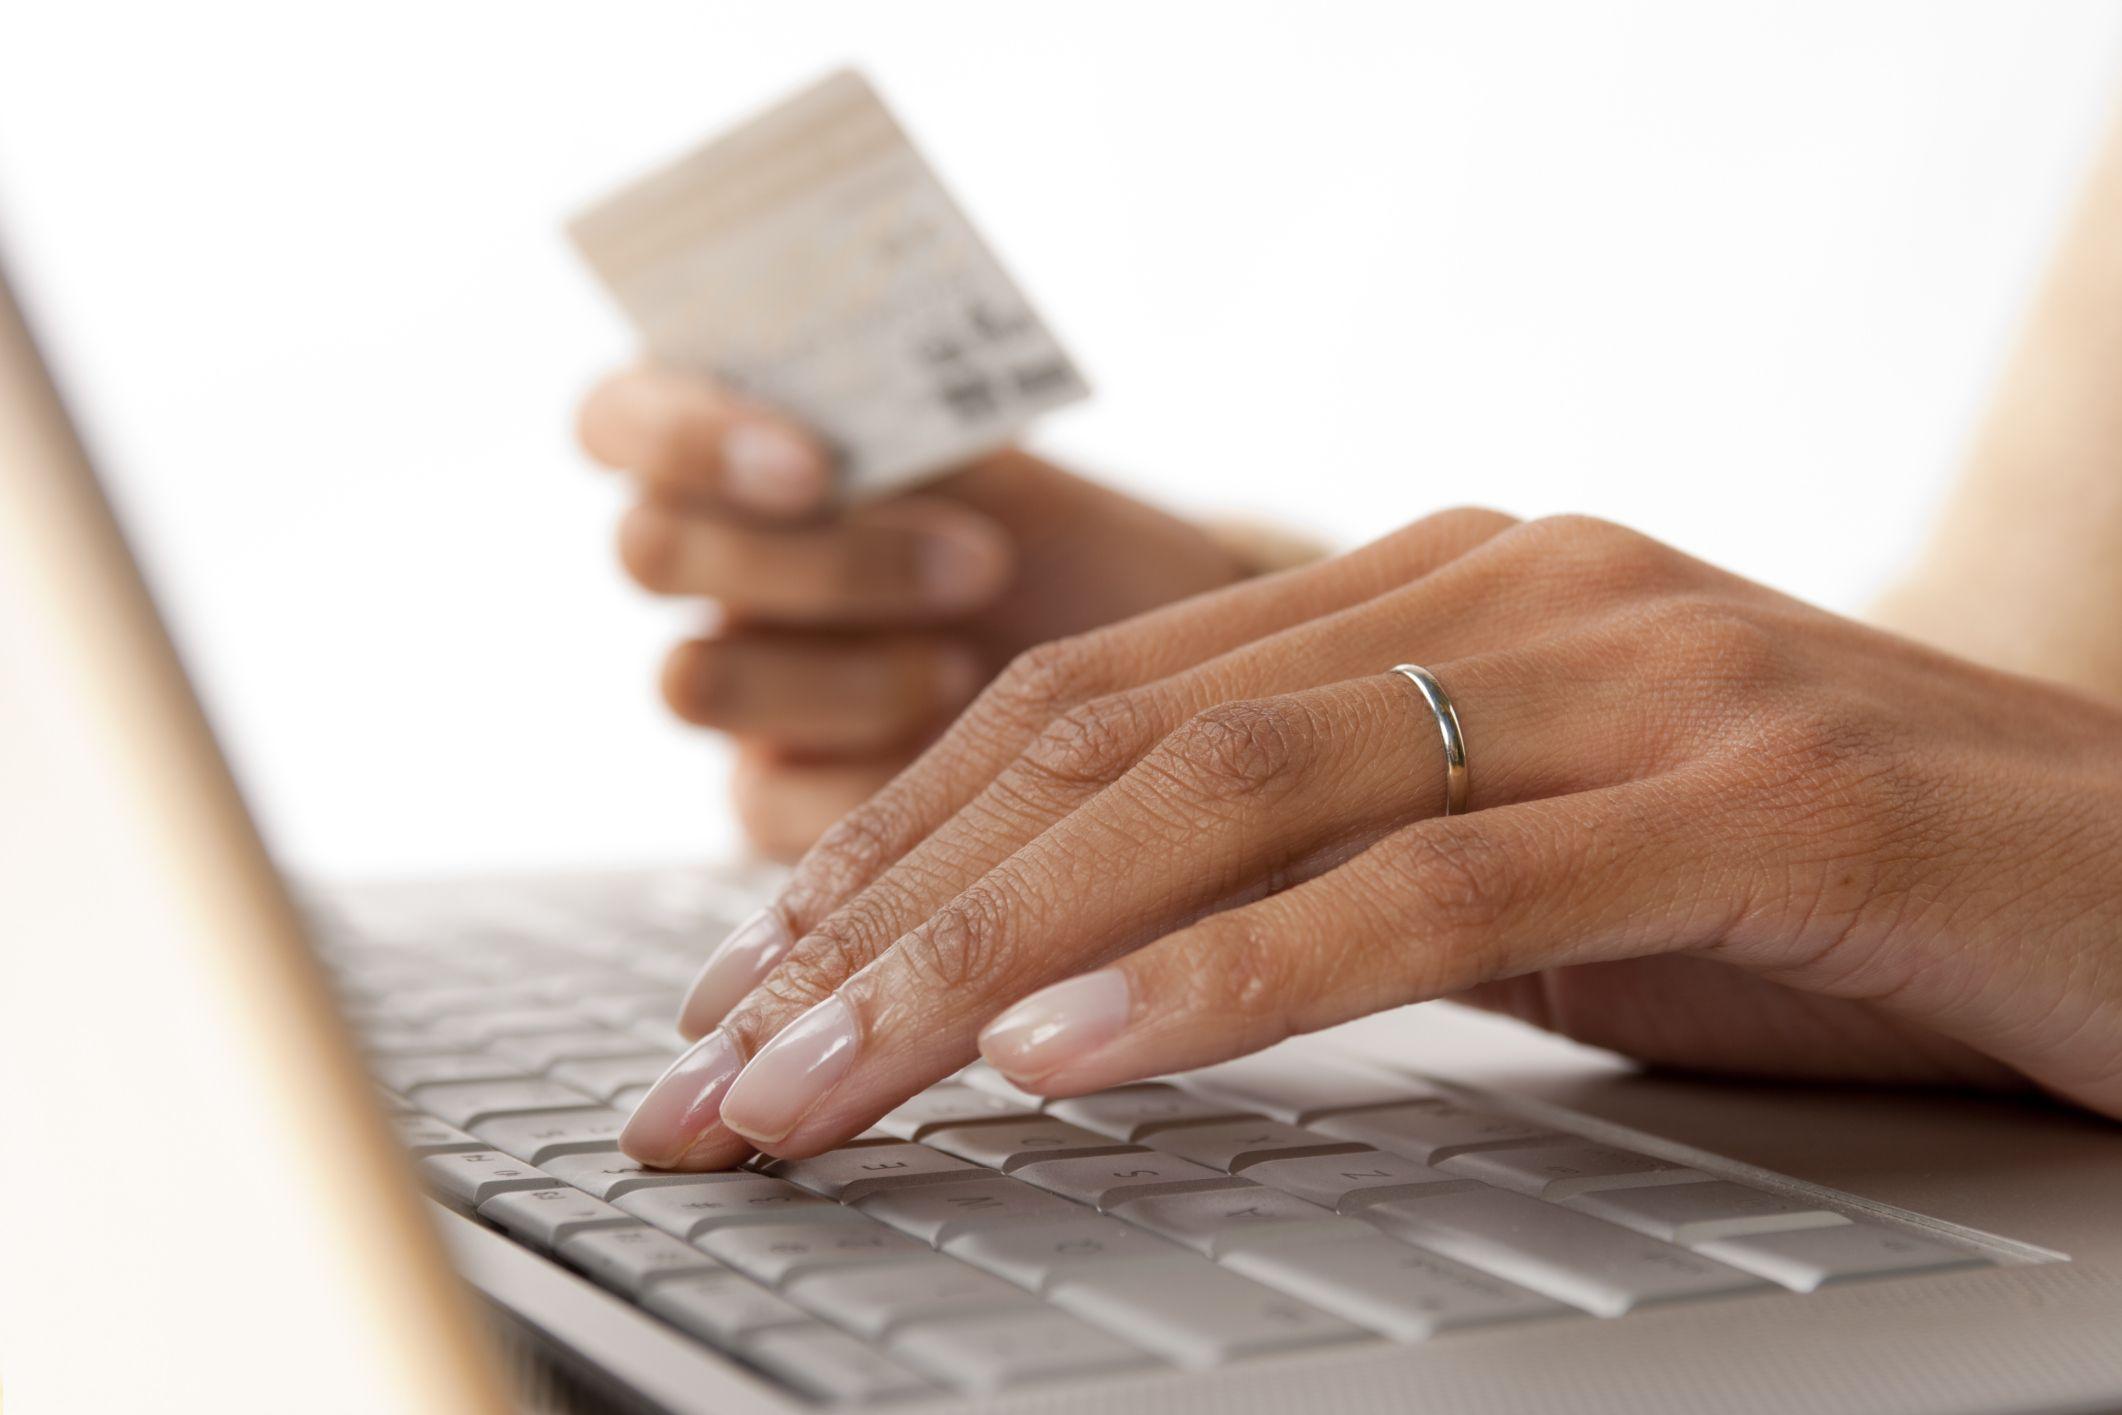 Shop for Deals Online (With images) Best credit card